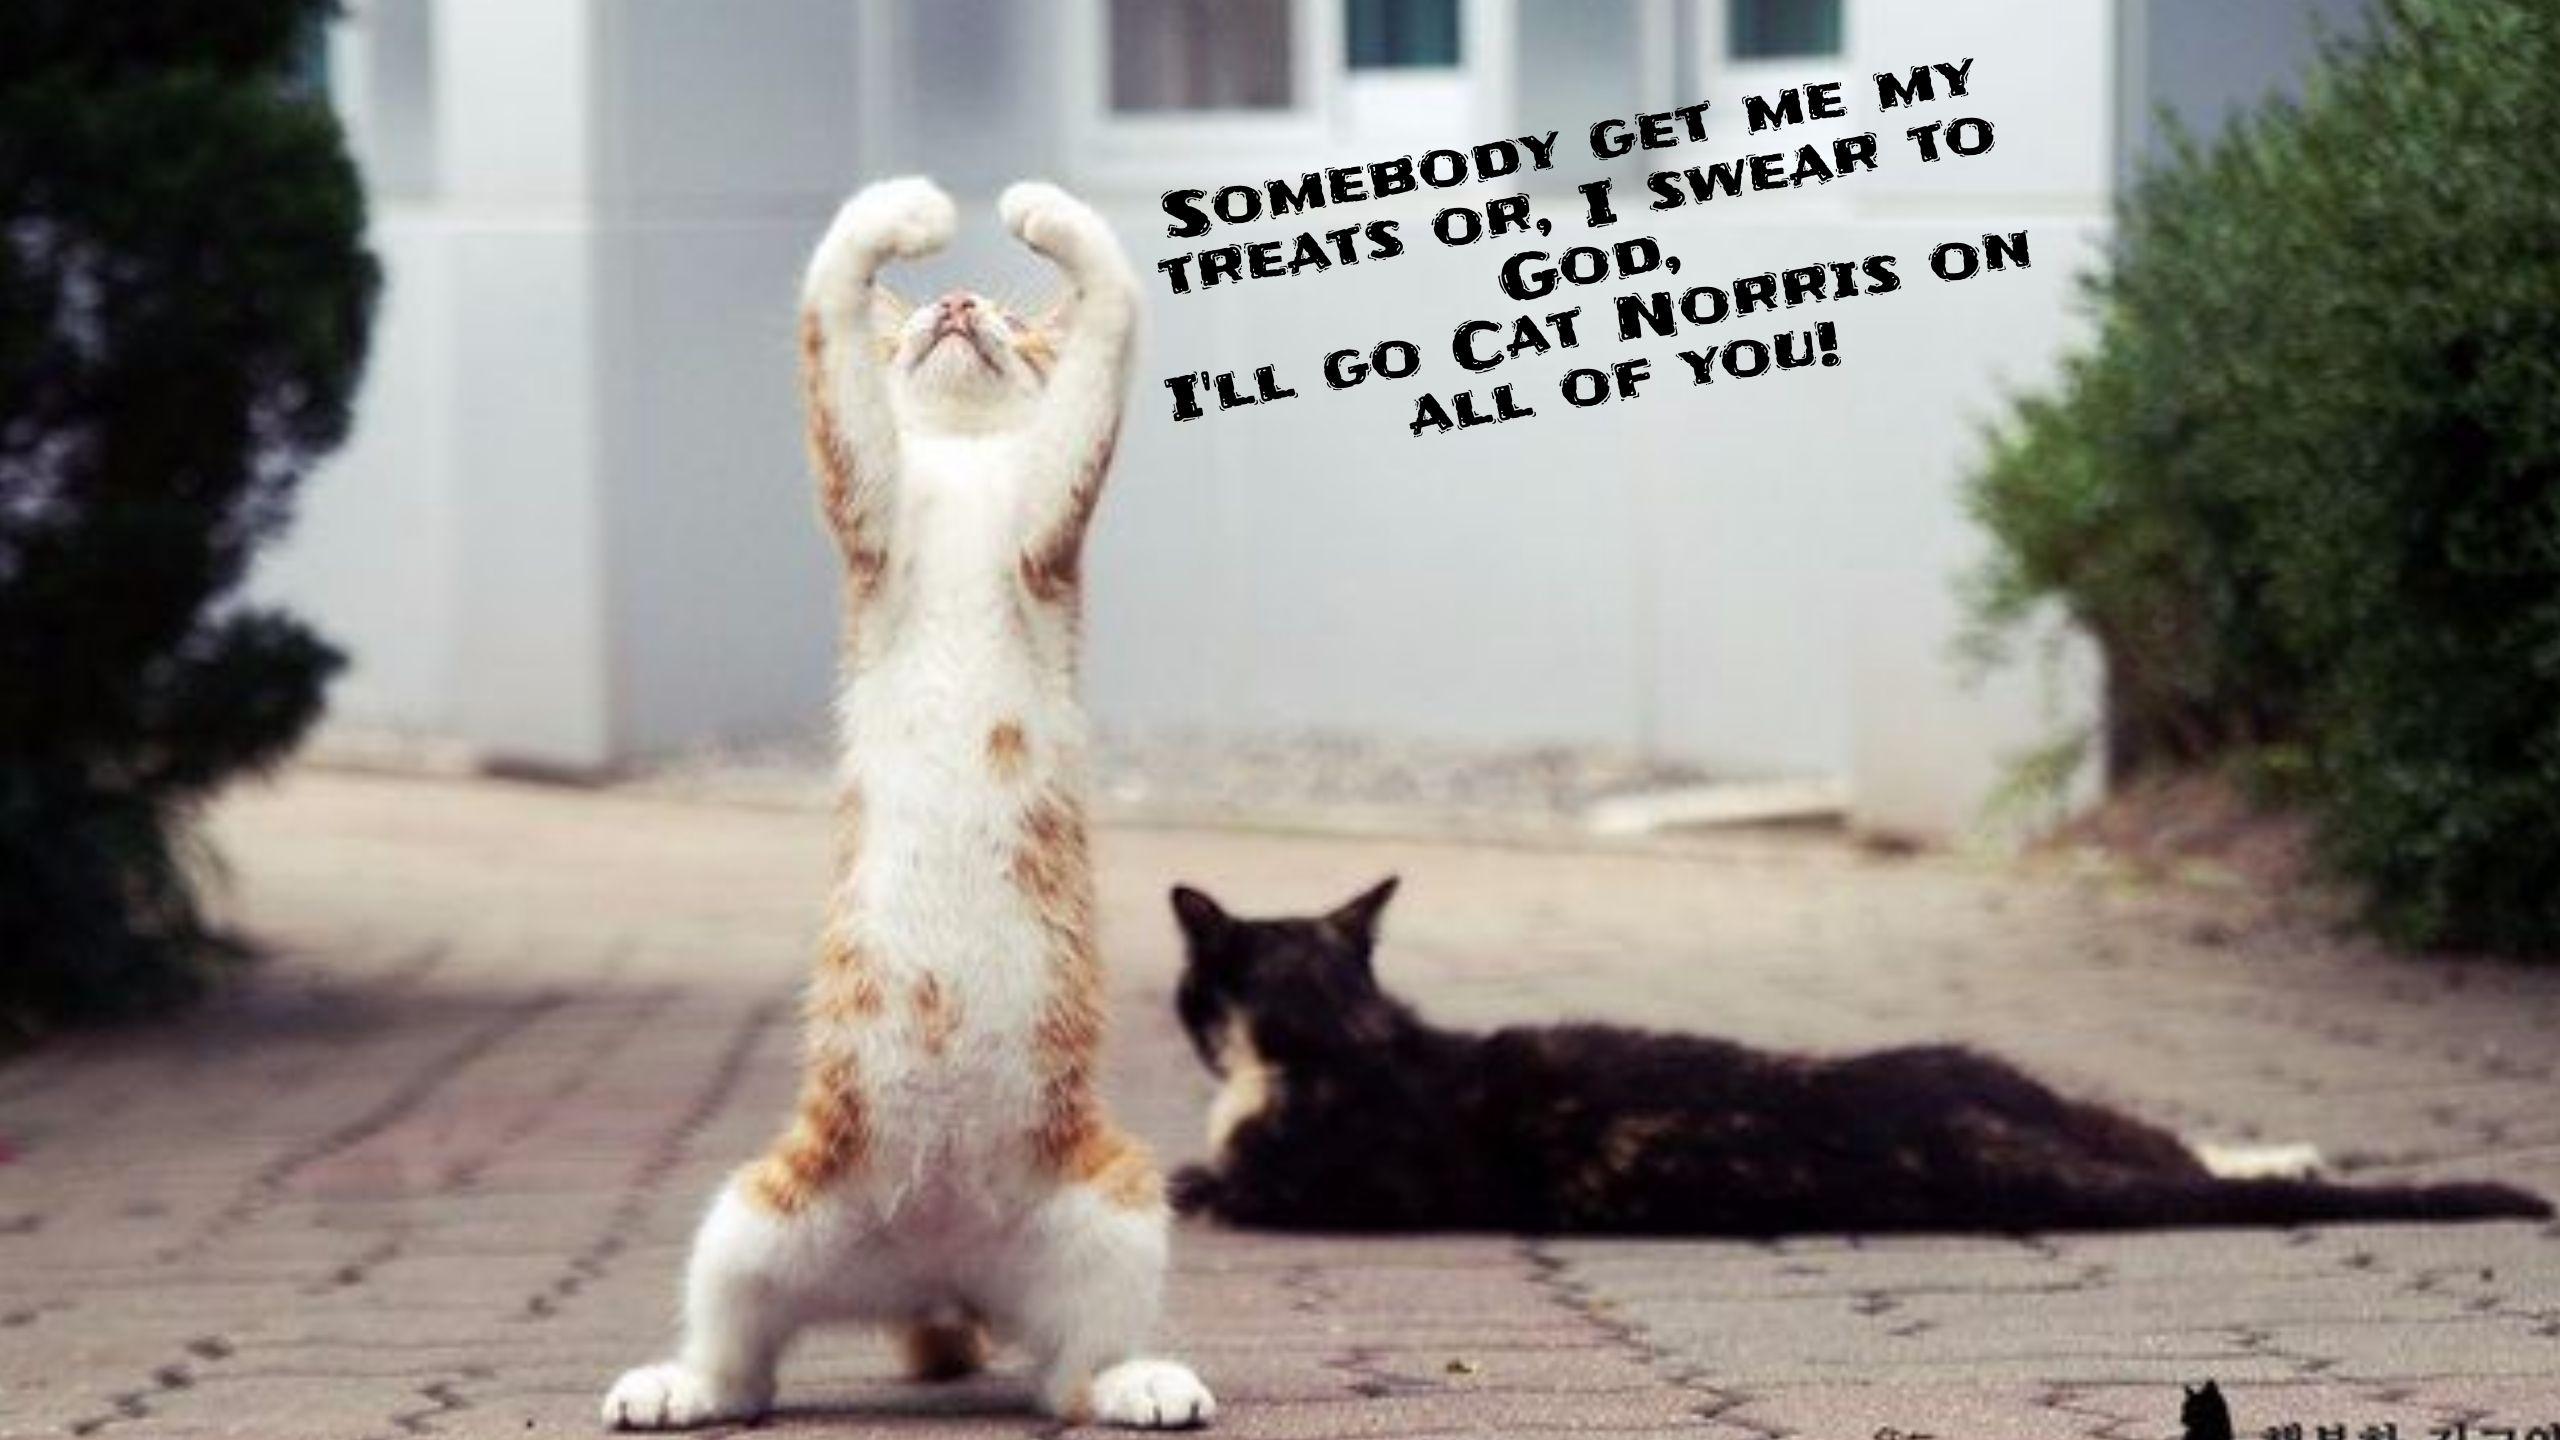 Https Www Youtube Com Watch V I9cdnc48qde Funny Cat Memes Cat Memes Funny Cats